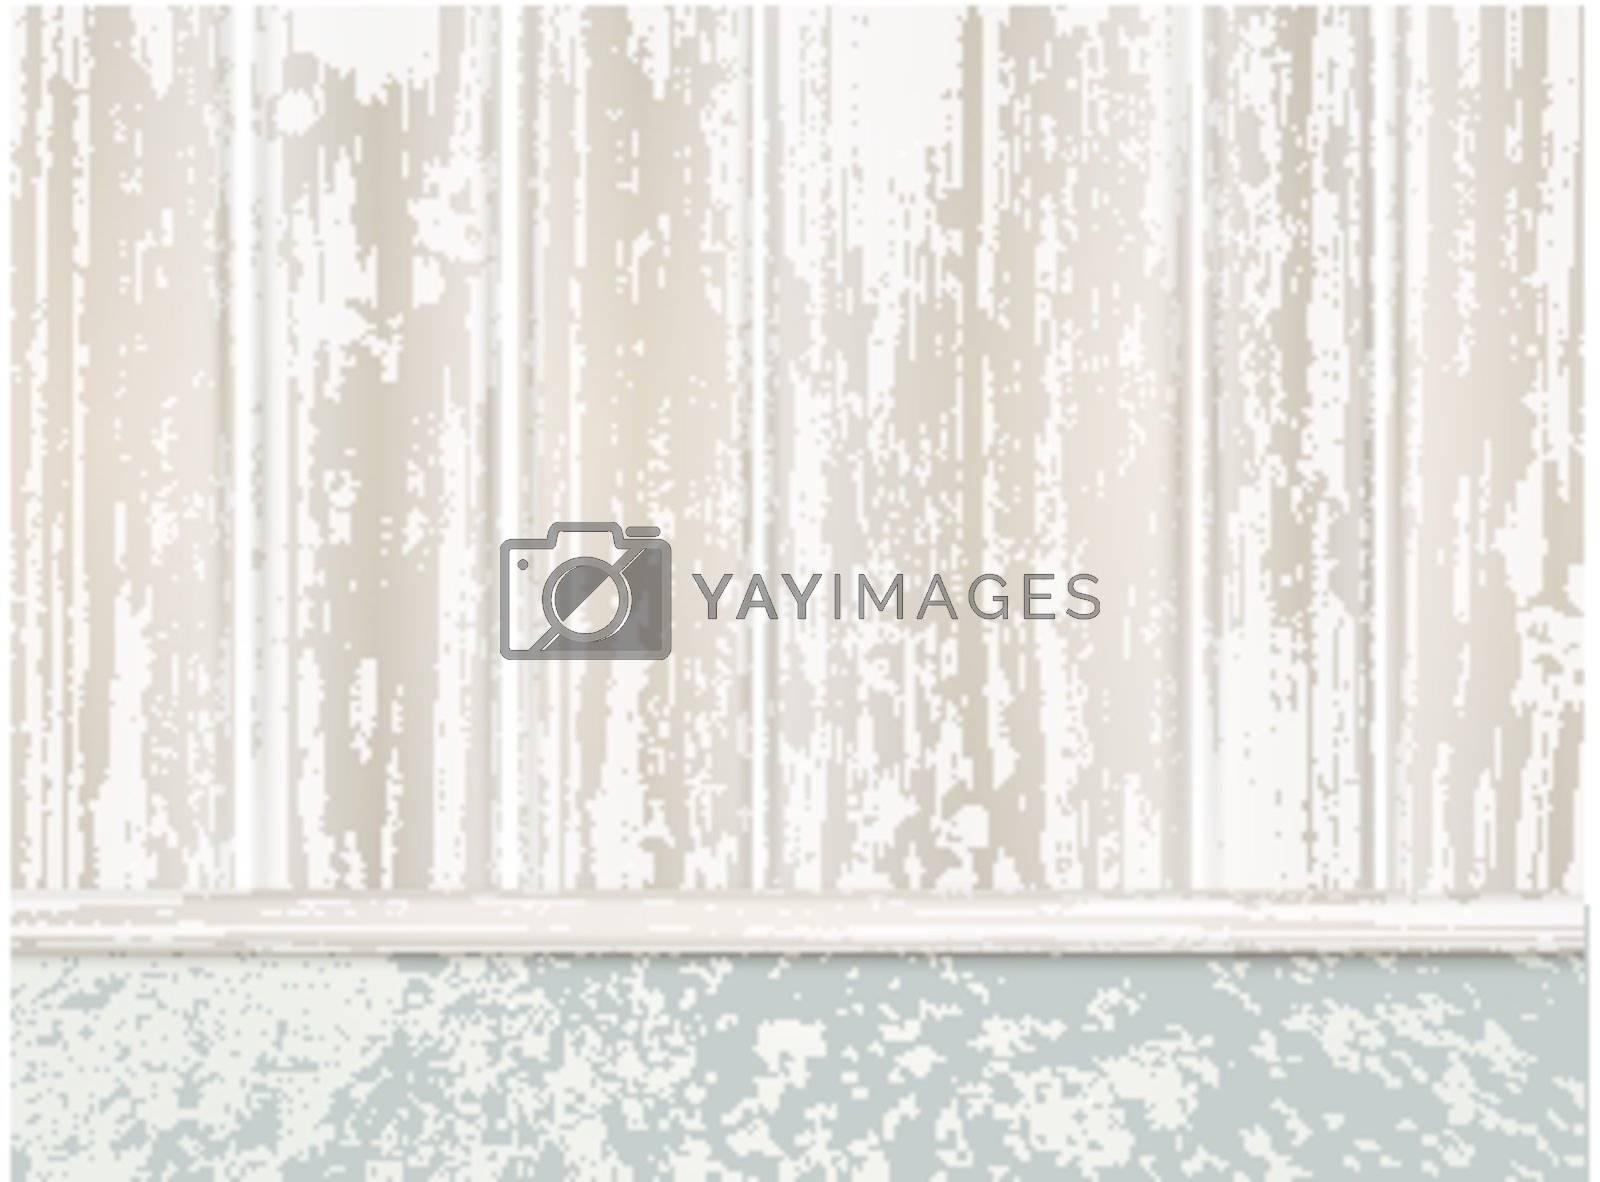 wooden fence at asphalt, copyspace